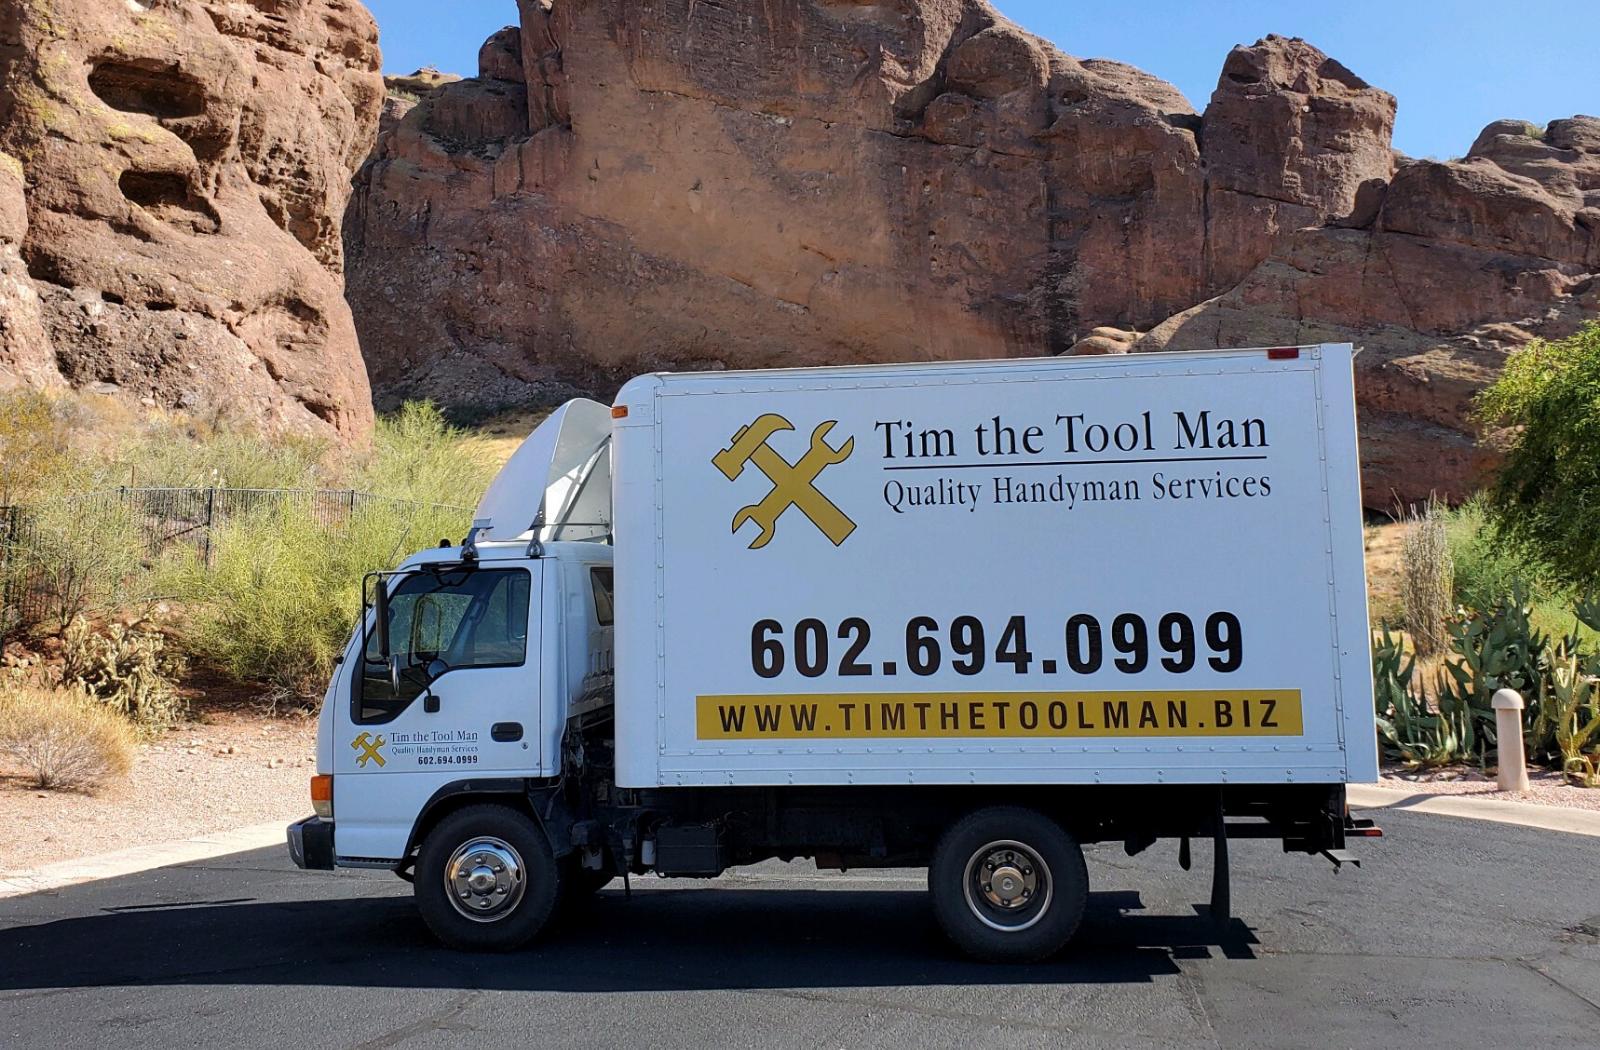 Tim the Tool Man